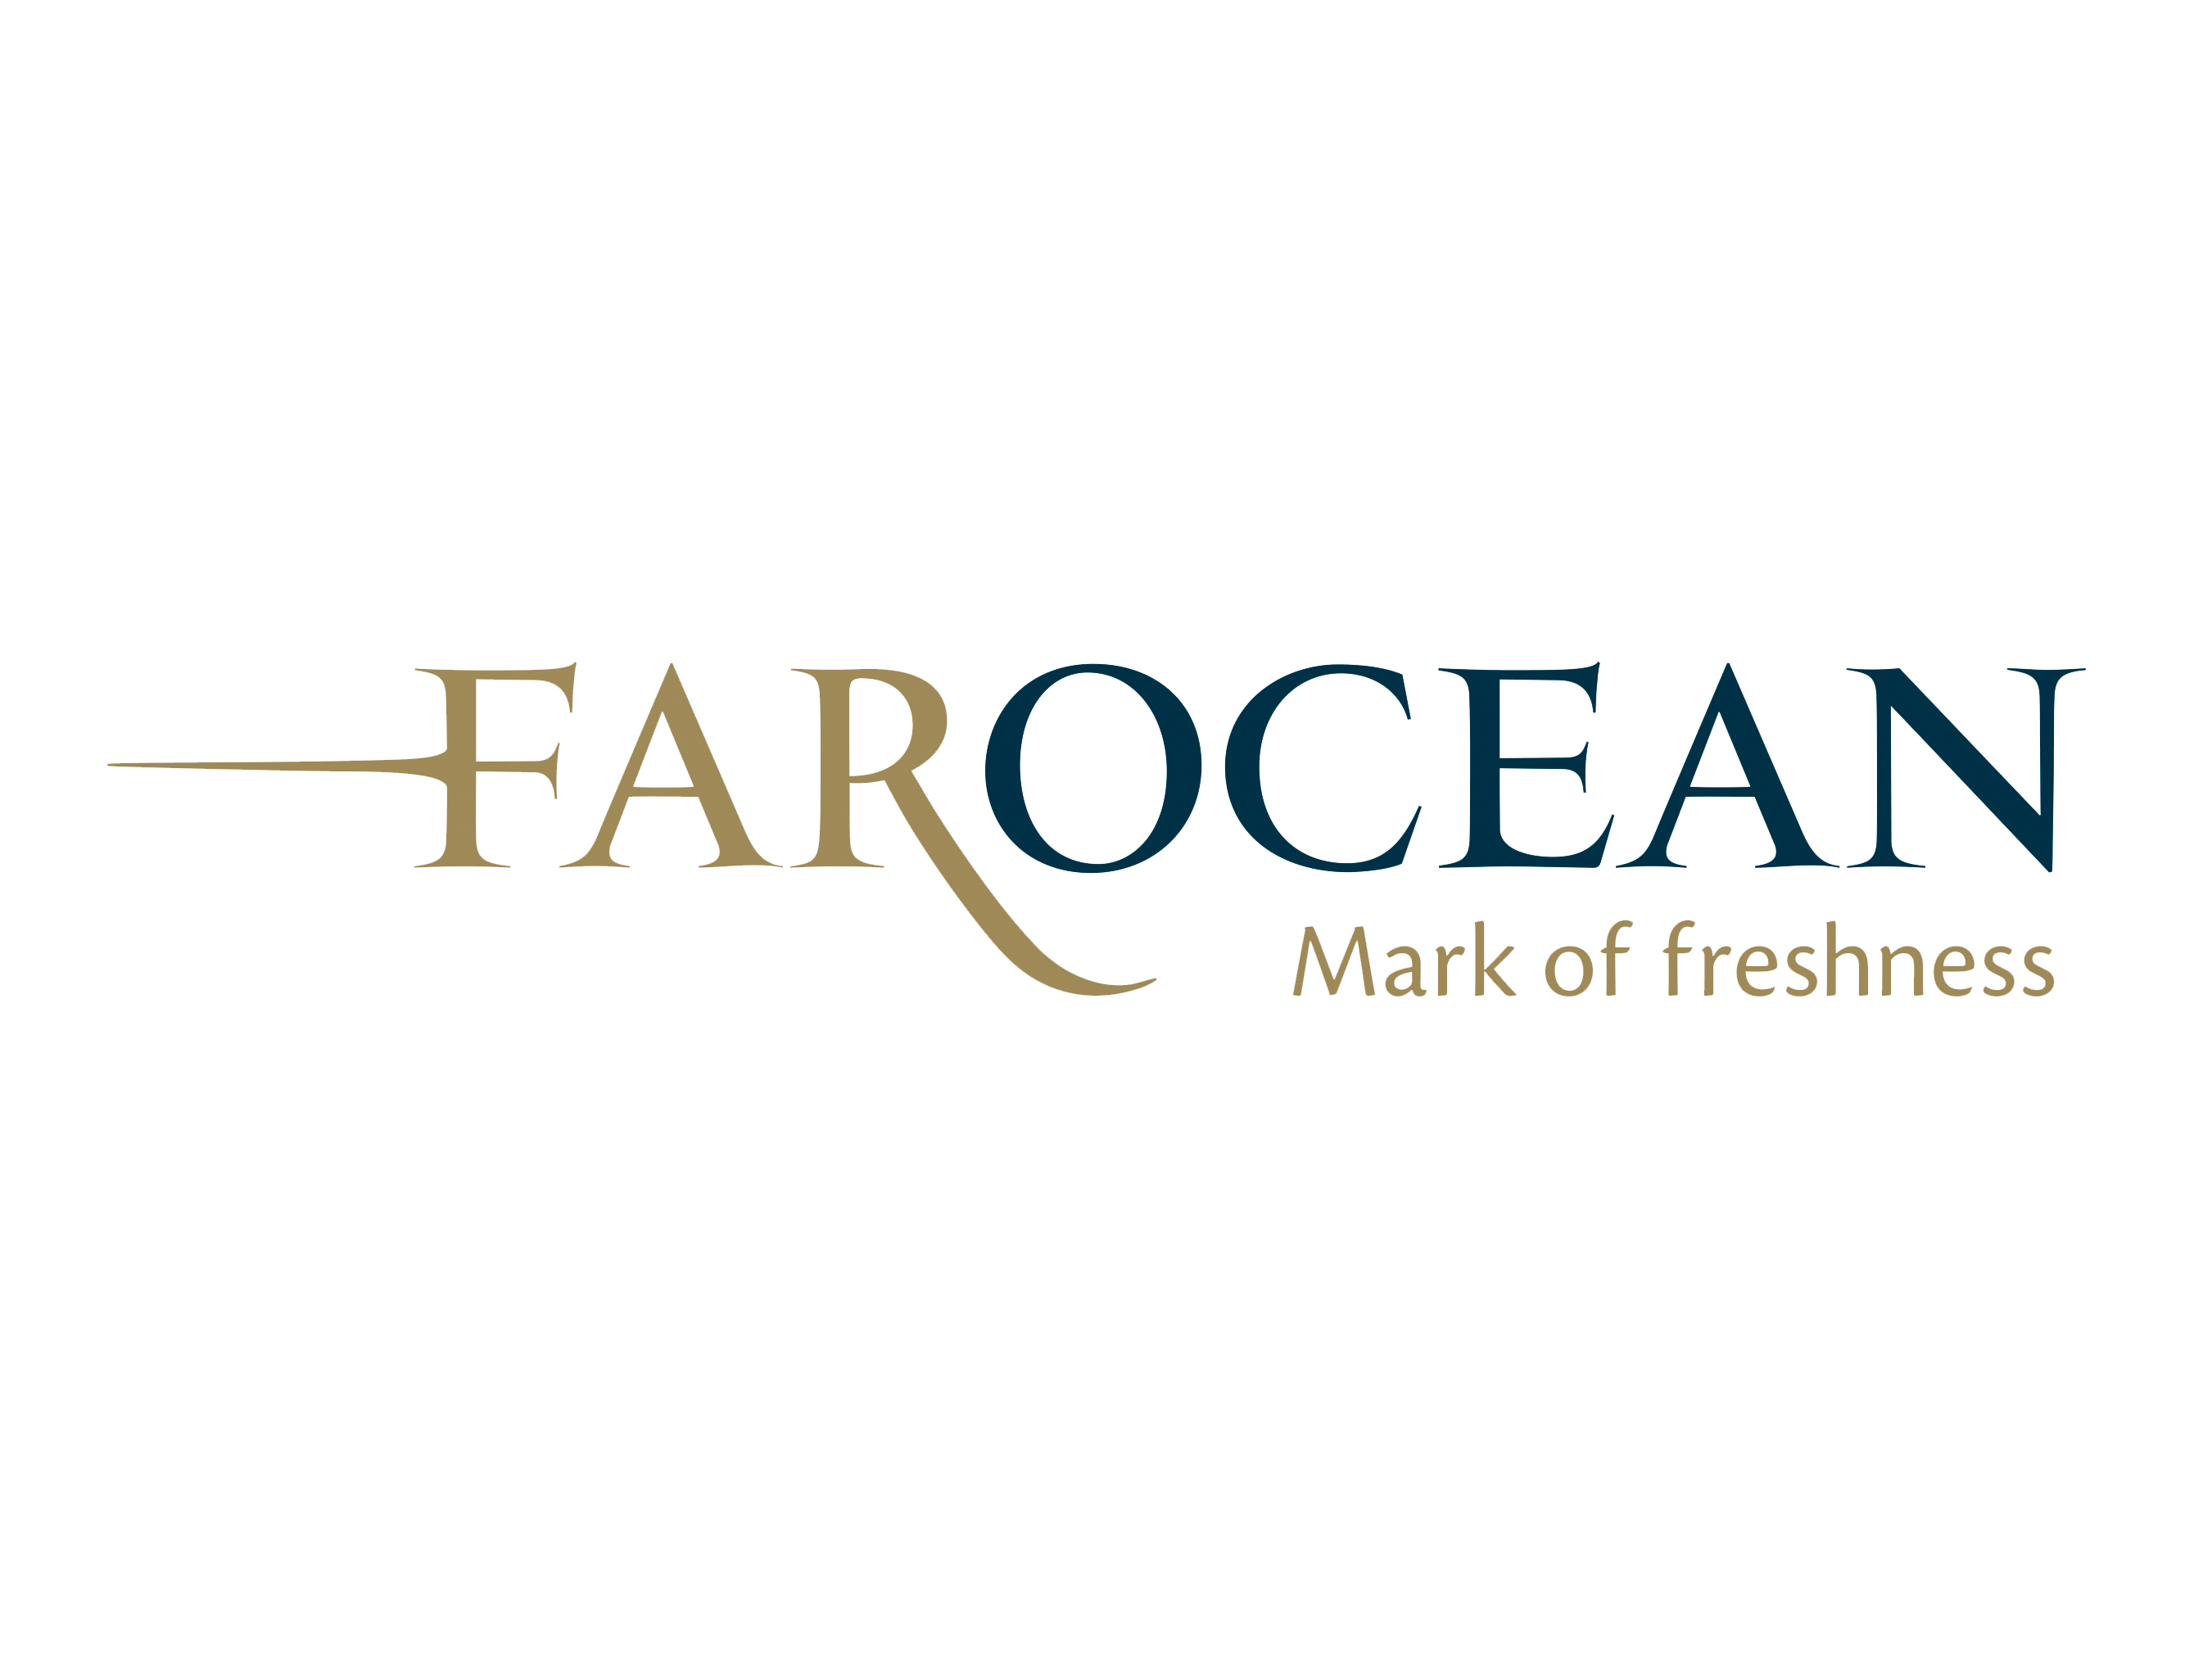 Far Ocean logo